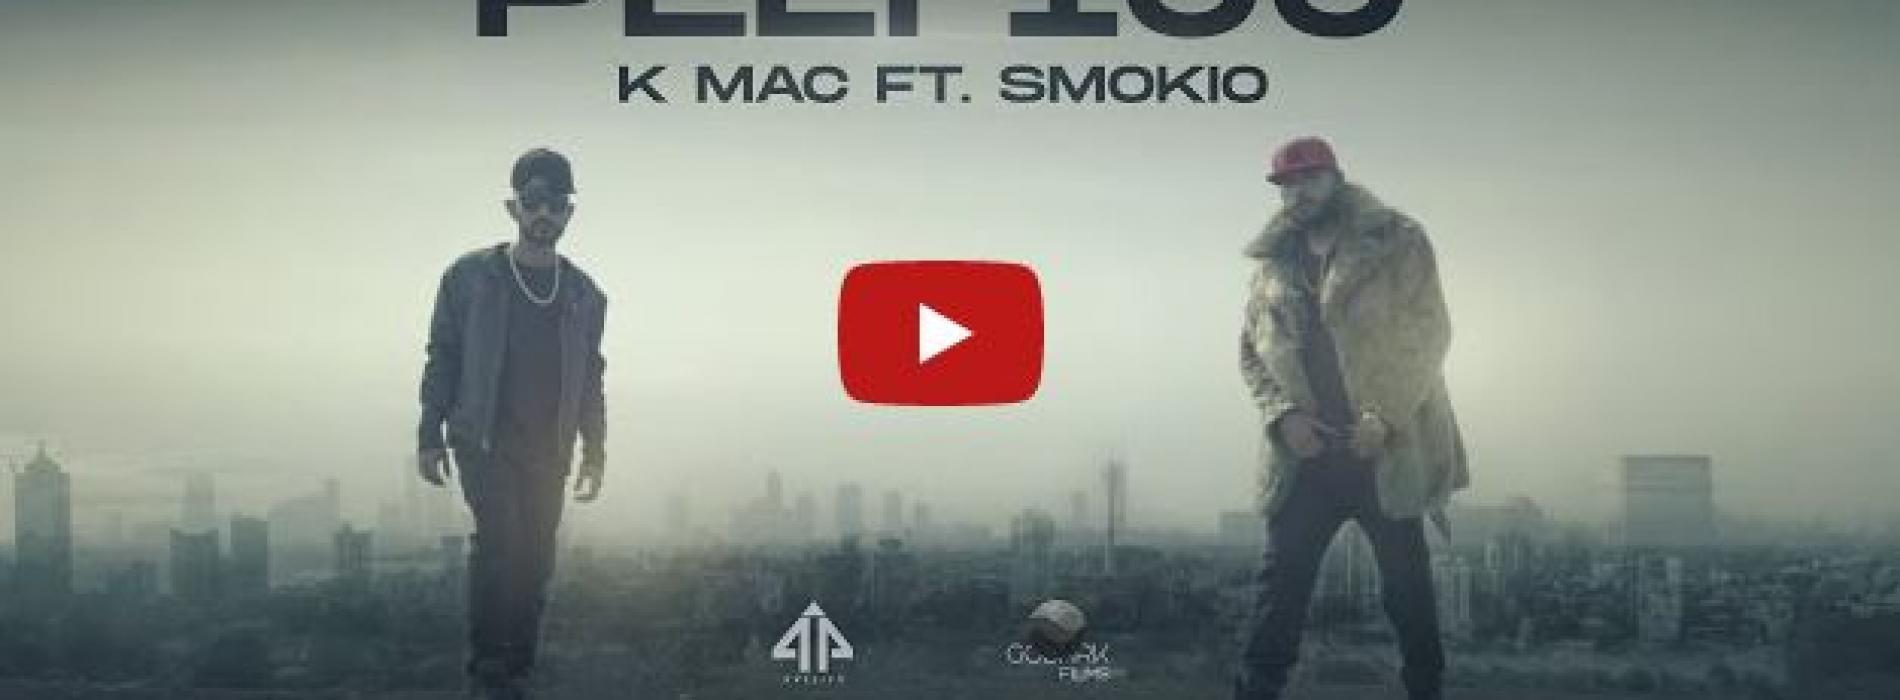 New Music : K Mac – Peli 100 ft Smokio (Official Music Video)